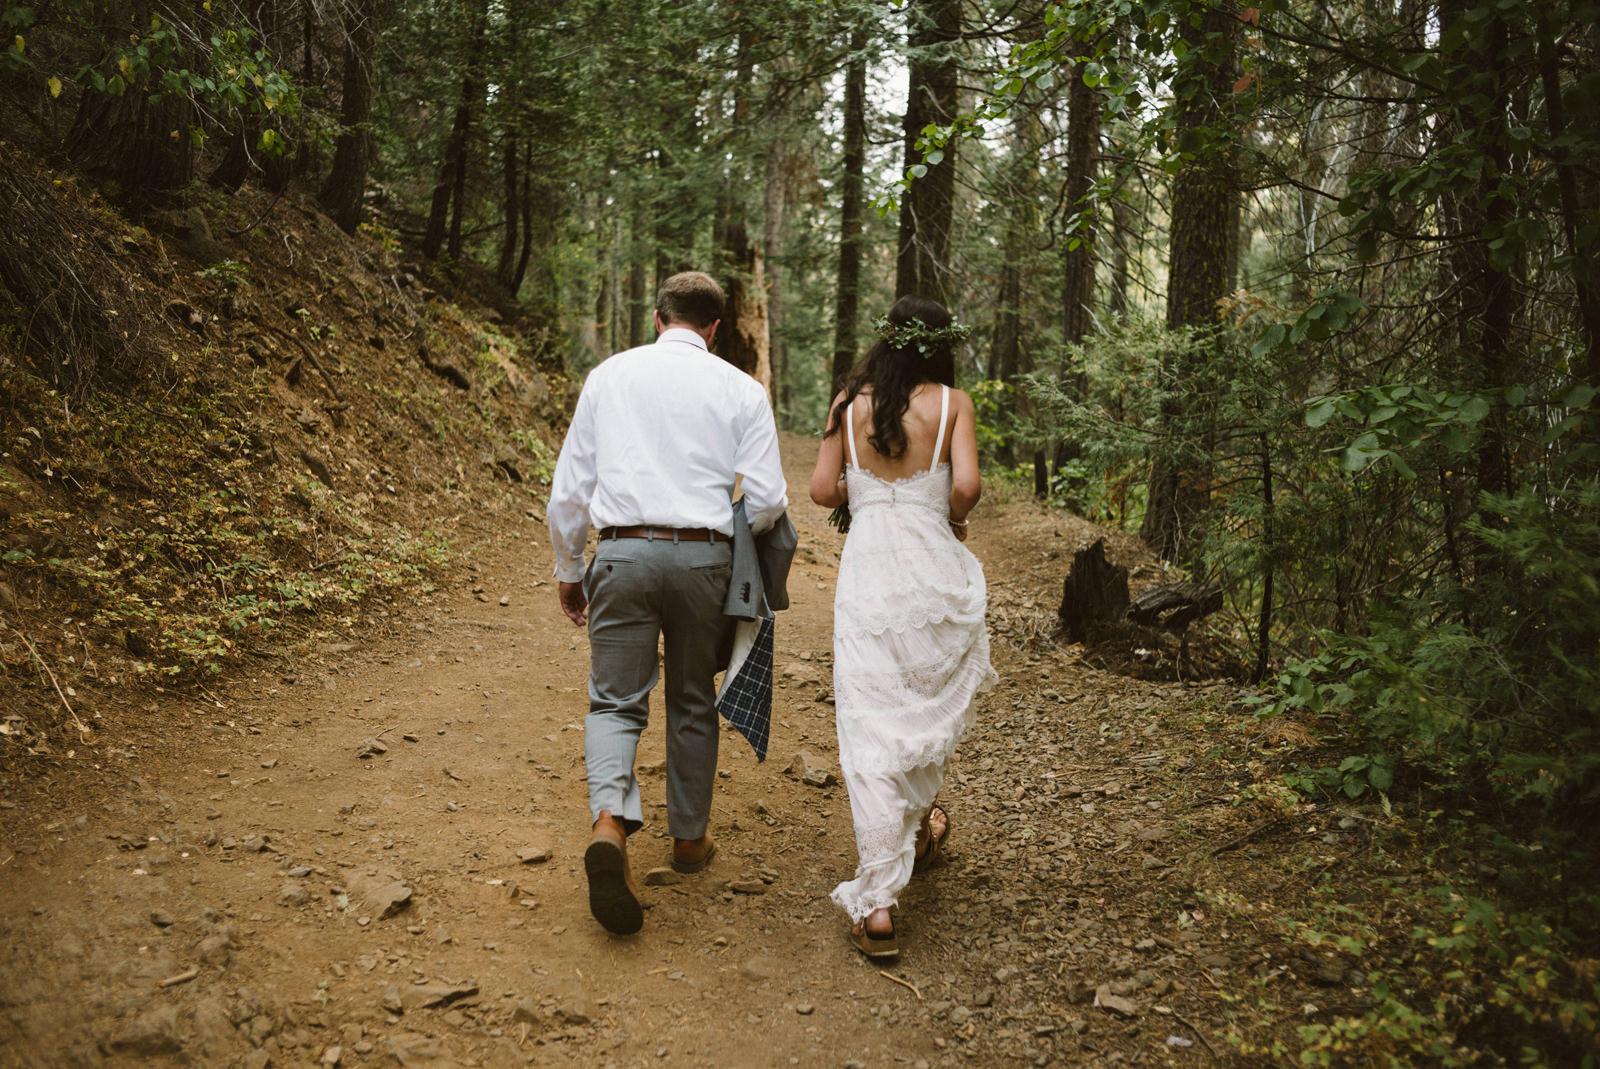 yosemite-intimate-wedding-073 YOSEMITE INTIMATE WEDDING